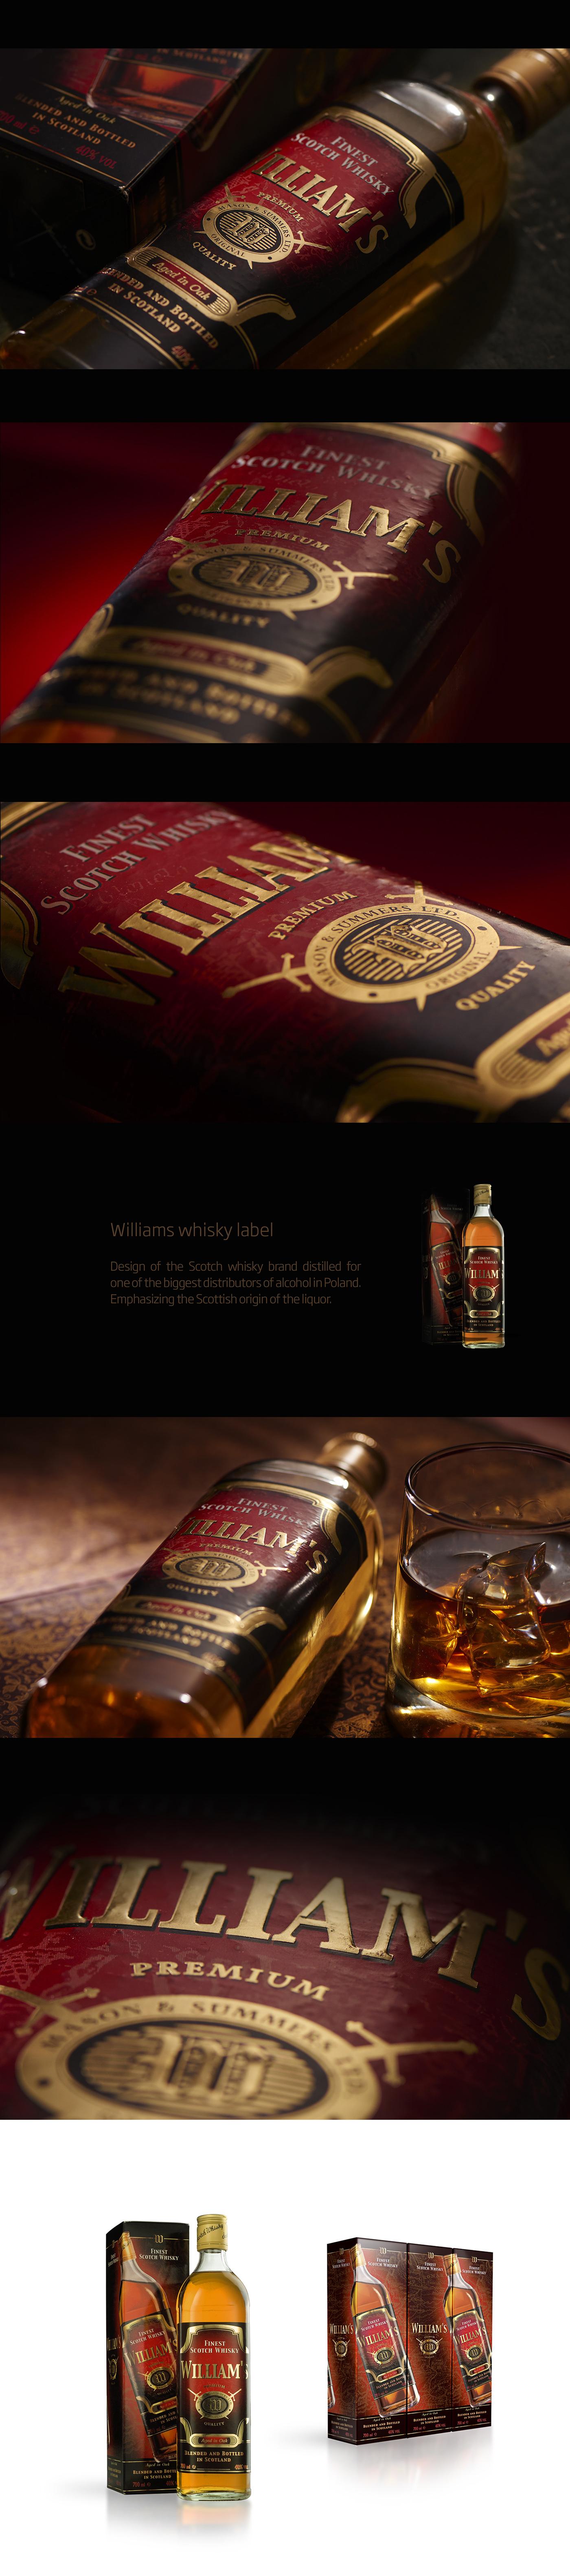 Whisky scotch williams alcohol whisky label Whisky Brand Whiskey polish whisky